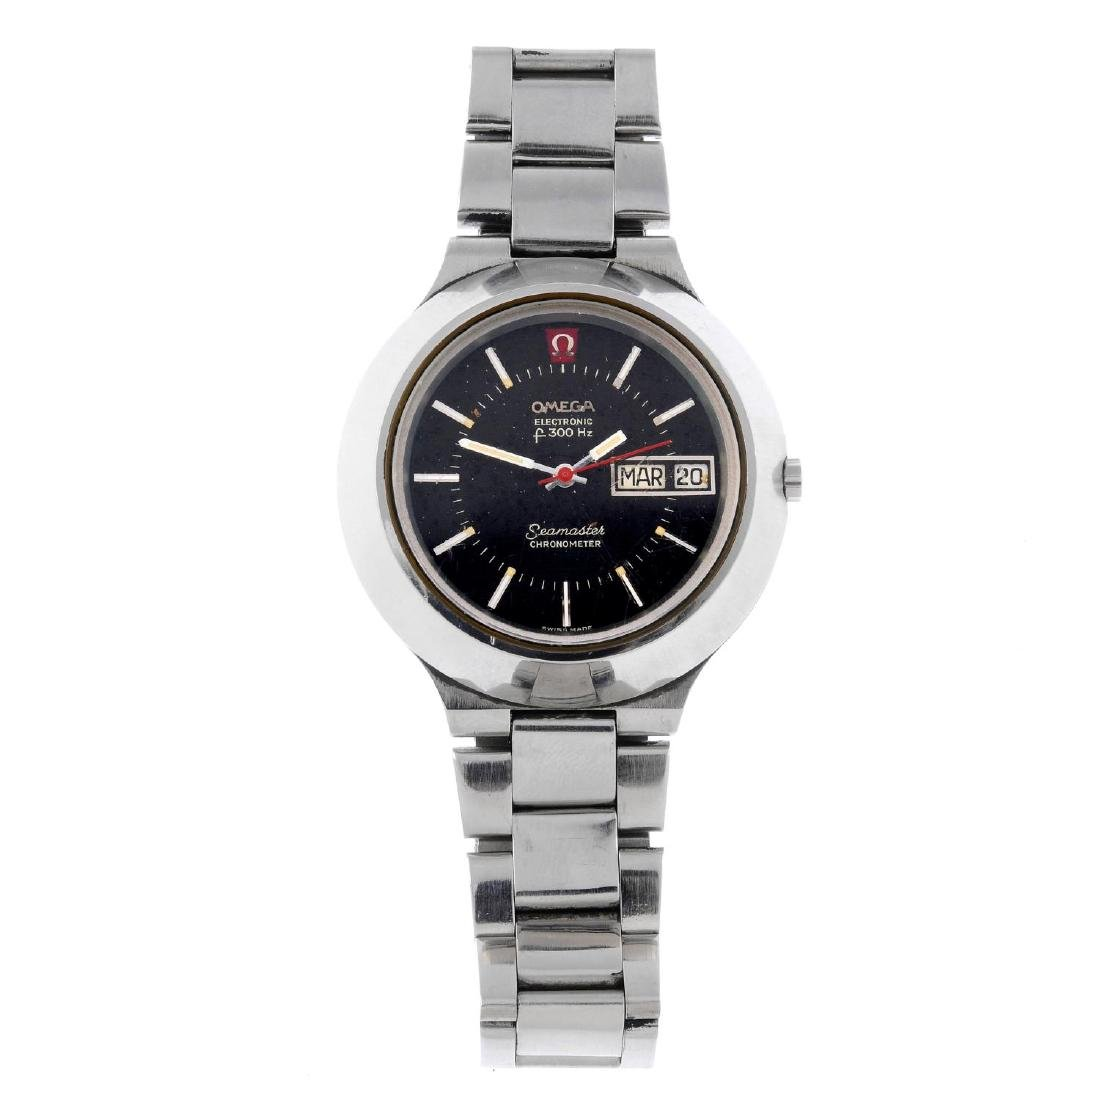 OMEGA - a gentleman's Seamaster F300Hz bracelet watch.